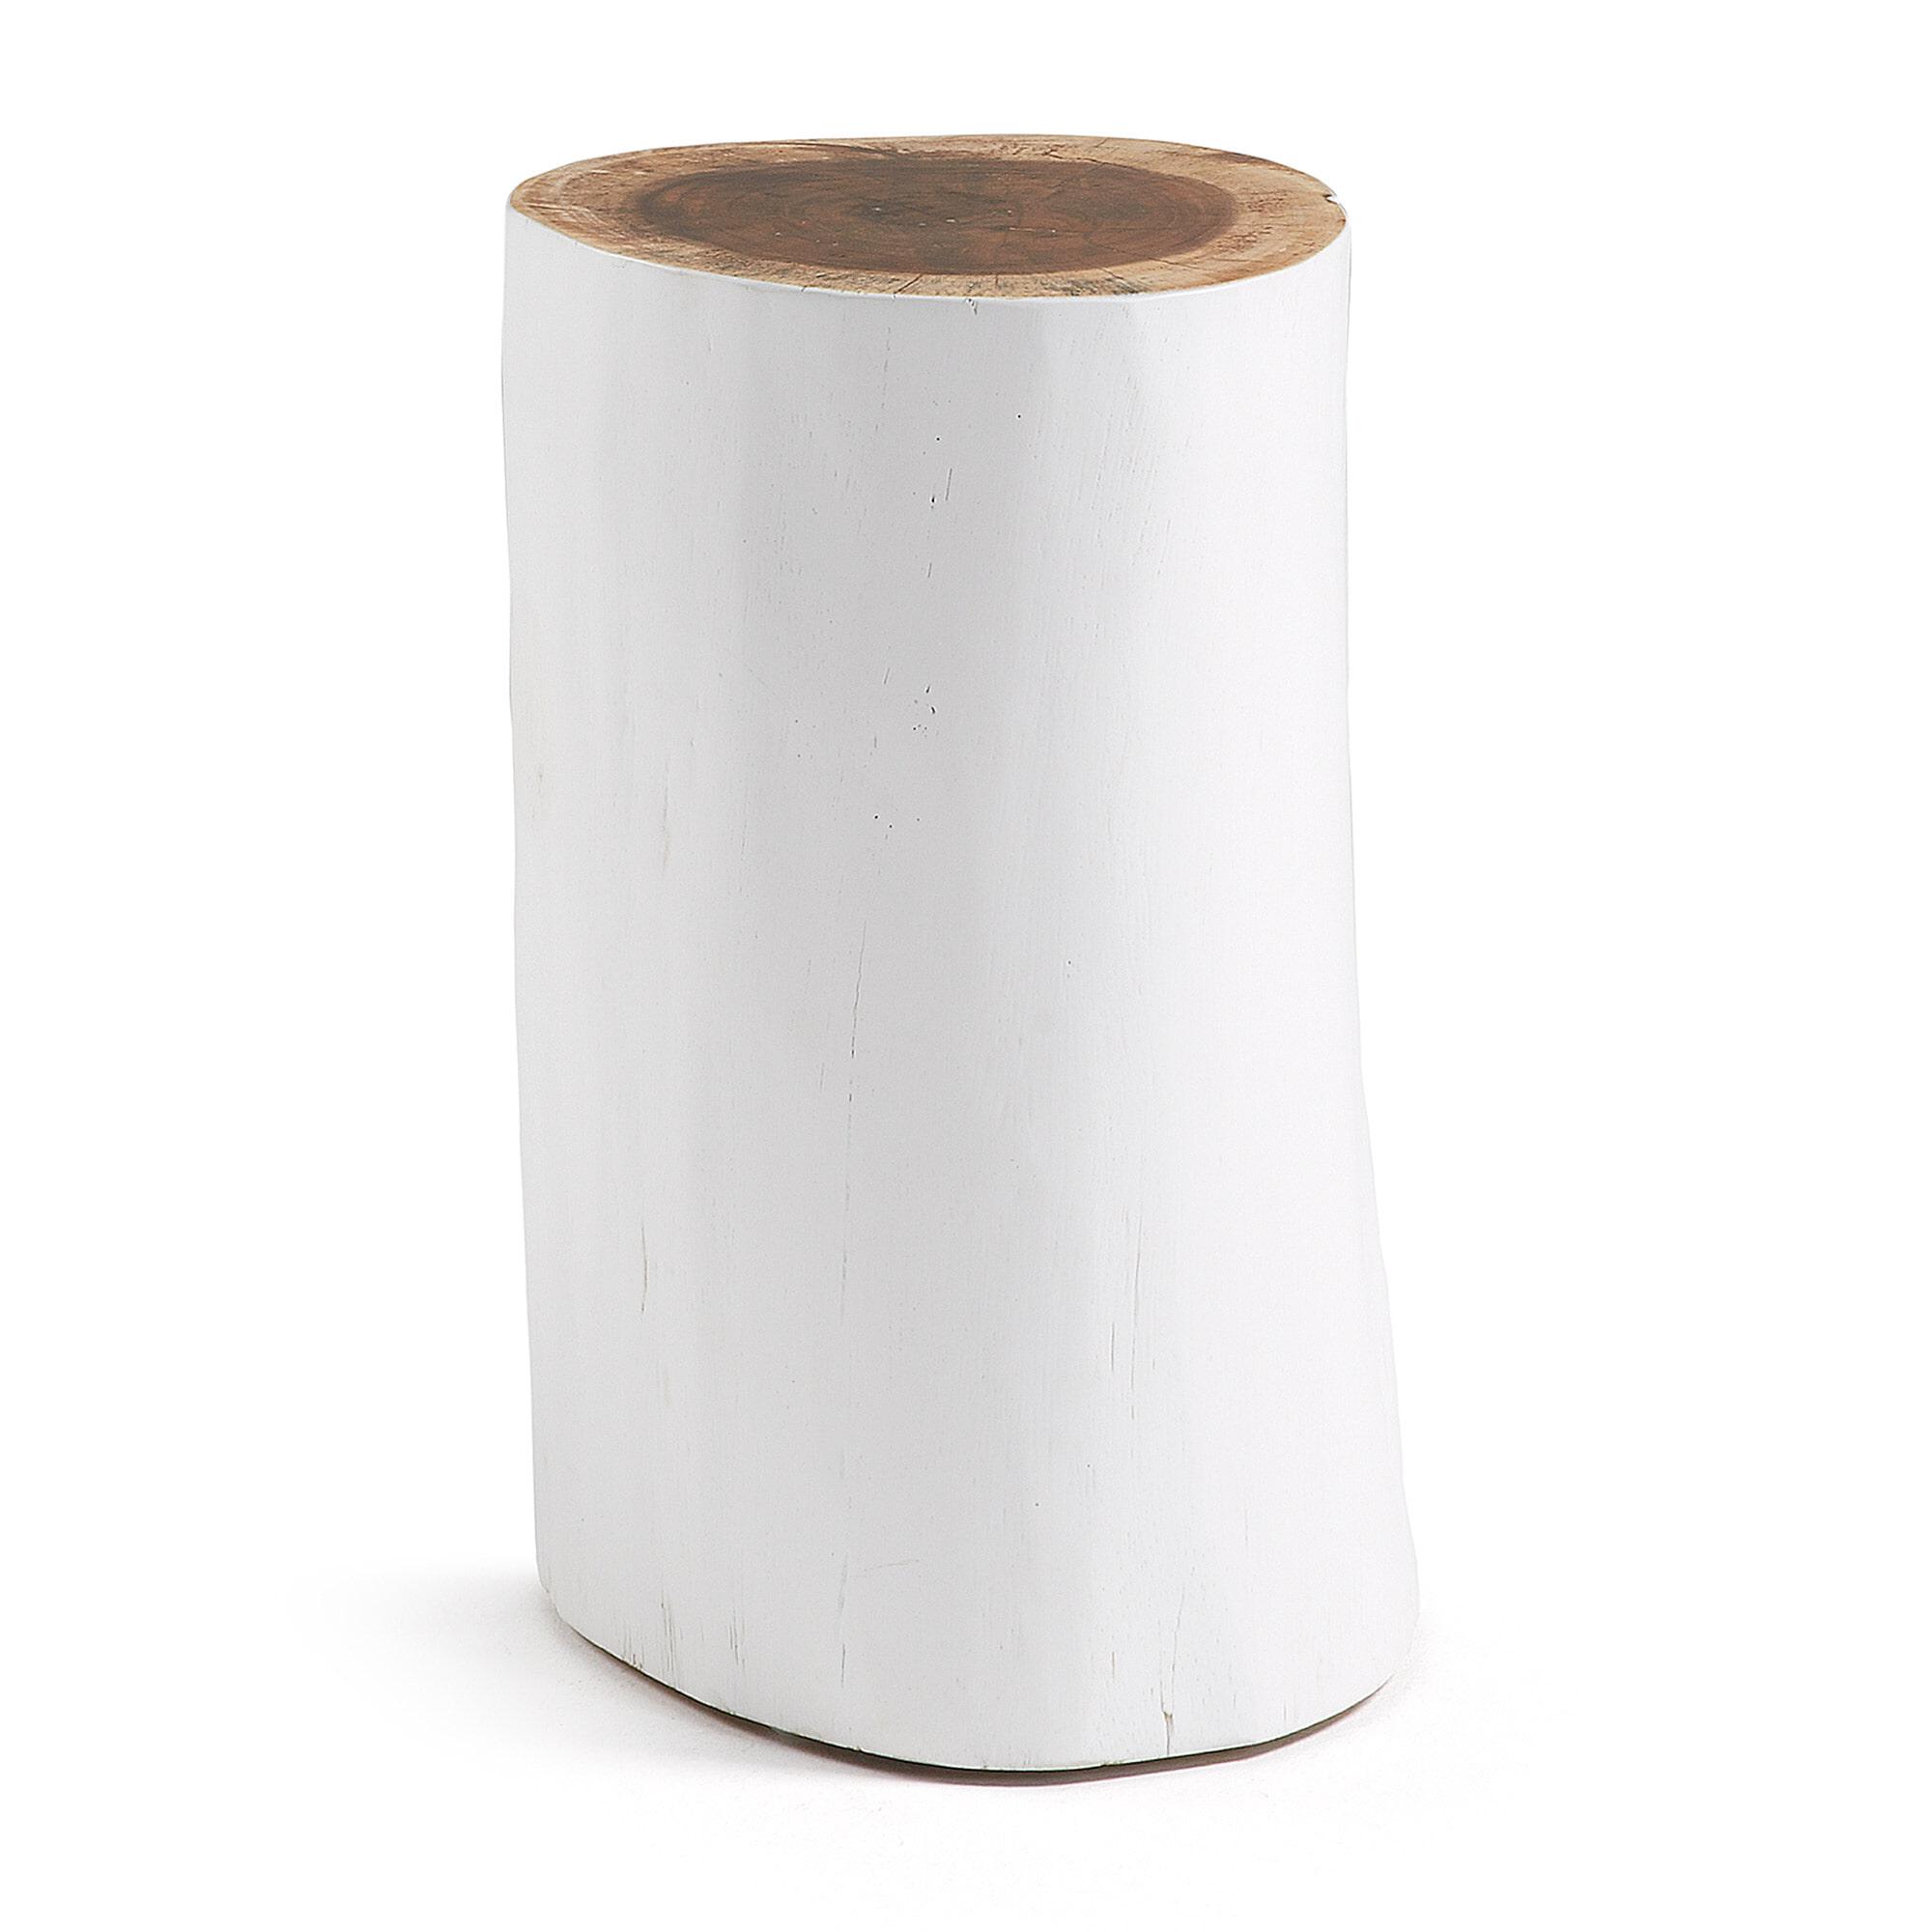 Kave Home Bijzettafel 'Hoppi' kleur Wit